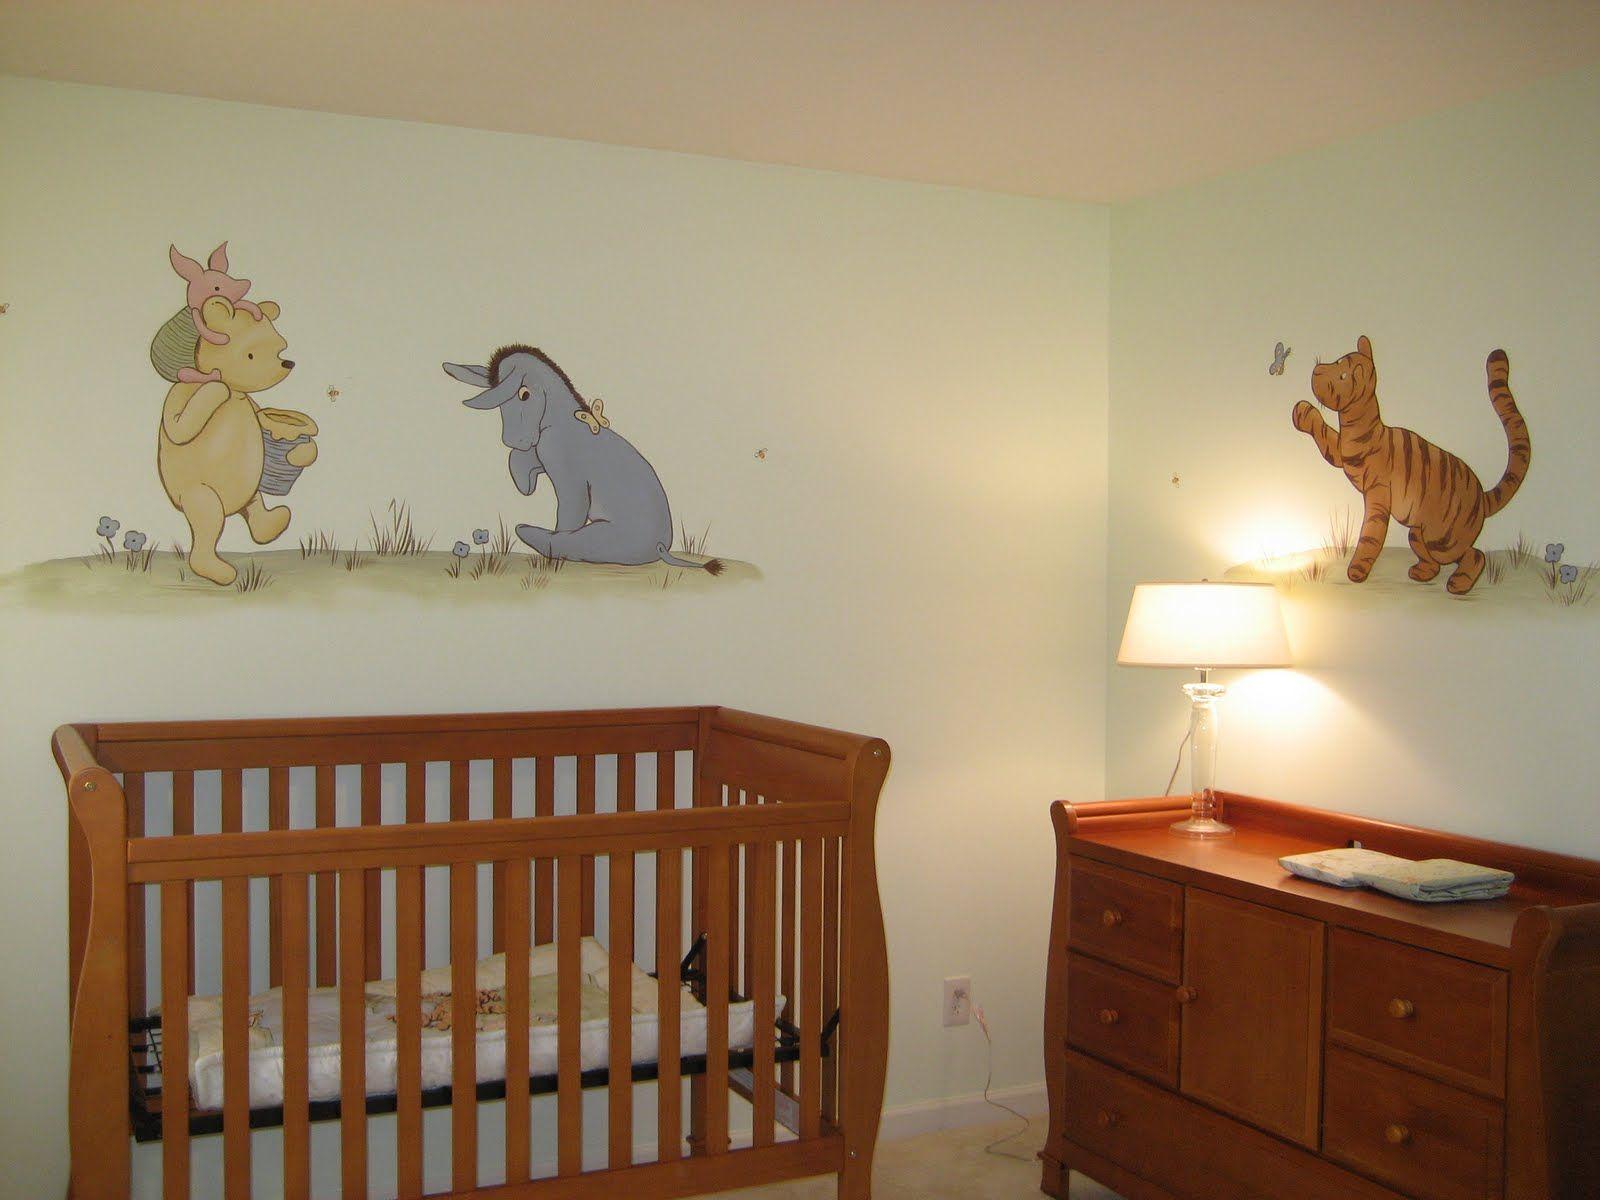 Winnie the Pooh nursery I would have those close to the